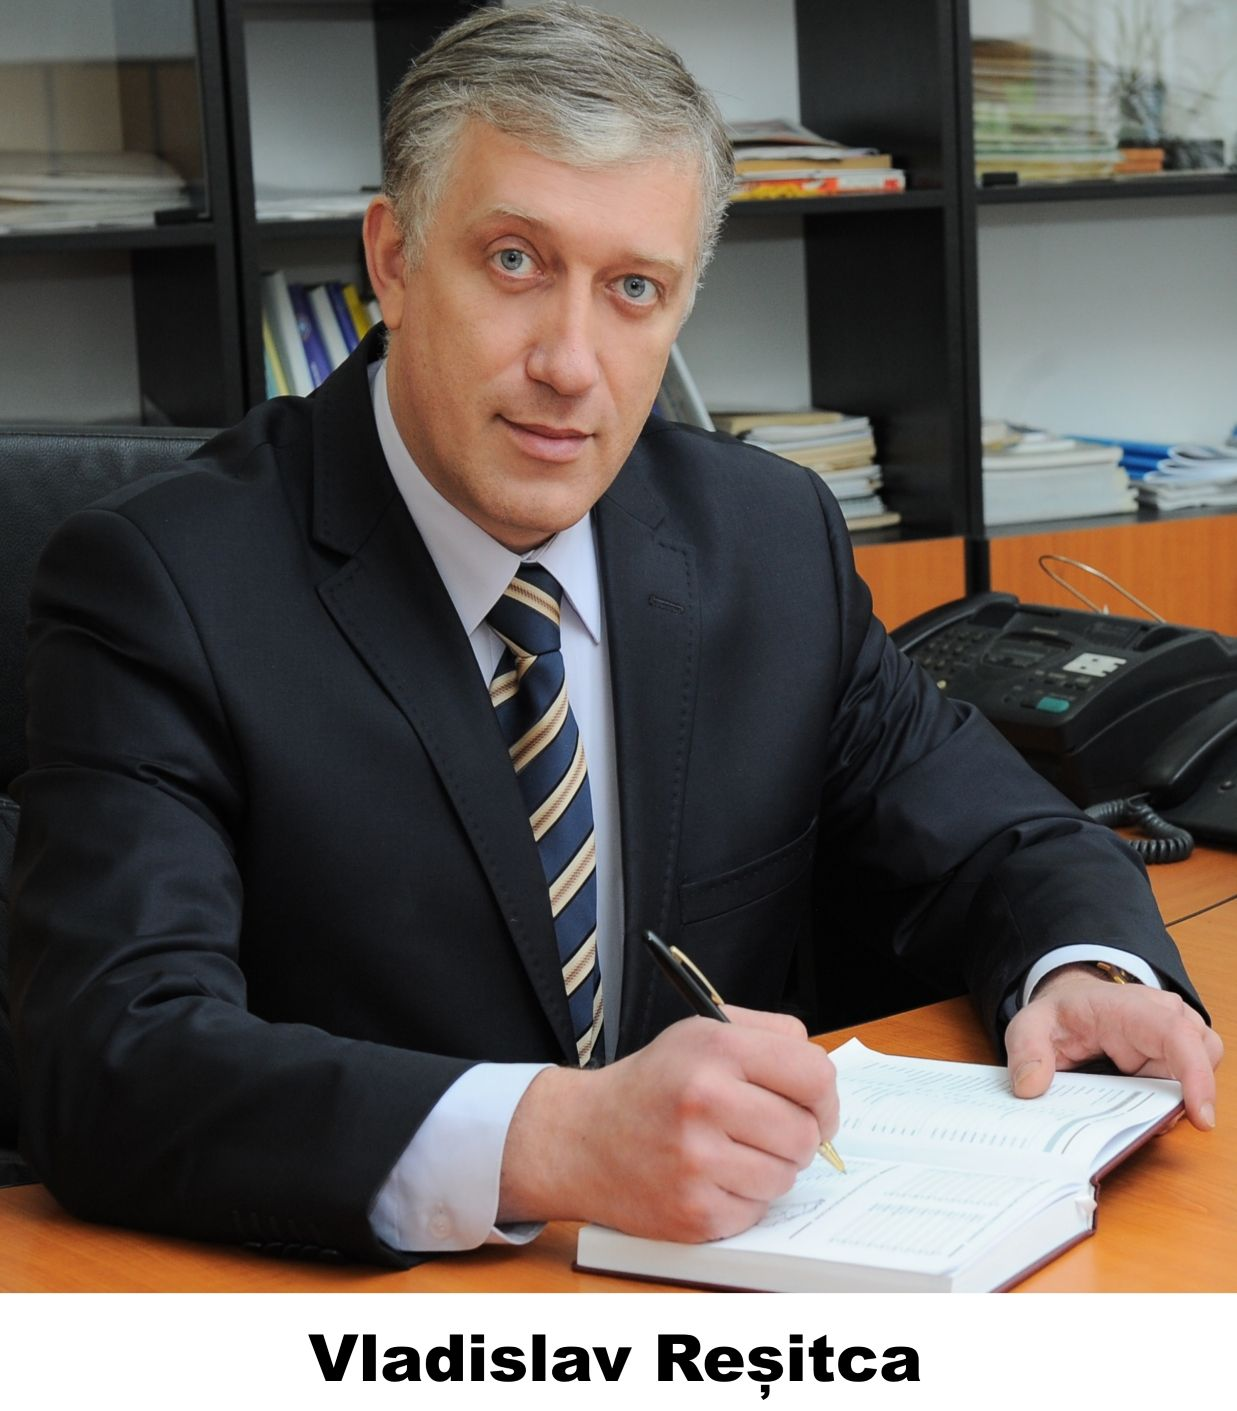 Vladislav Reșitca